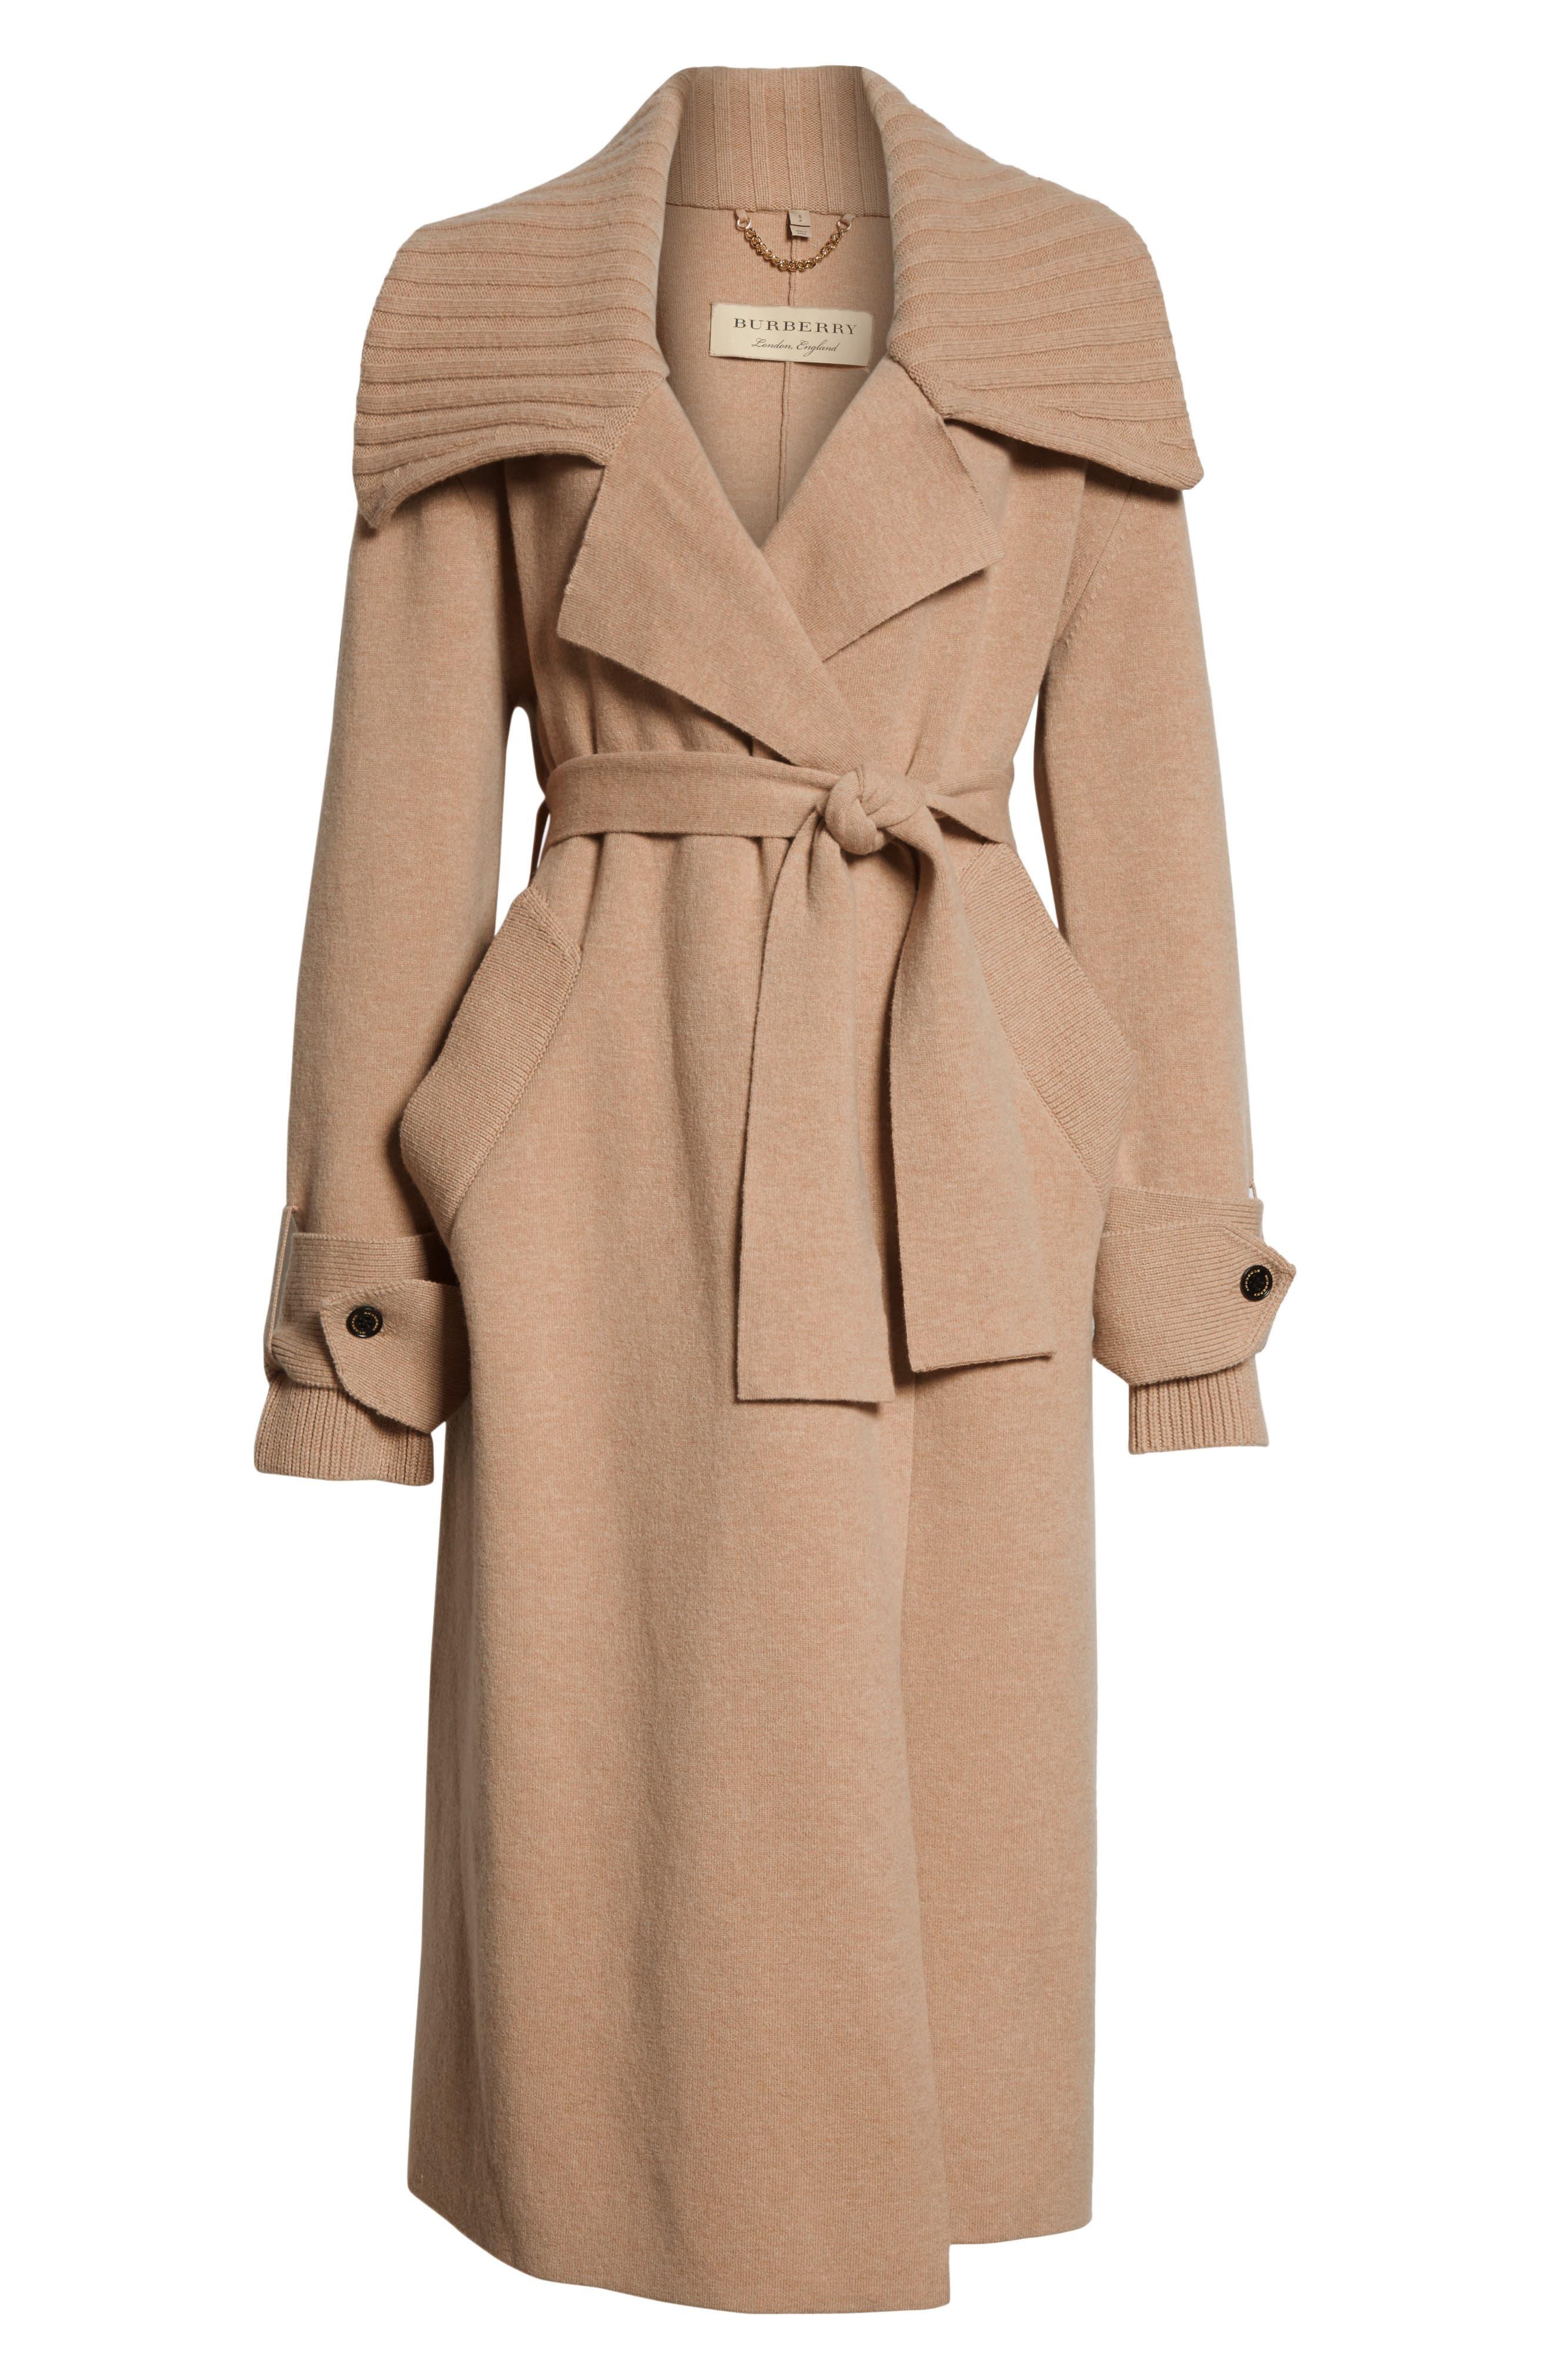 Piota Wool Blend Knit Trench Coat,                             Alternate thumbnail 7, color,                             Camel